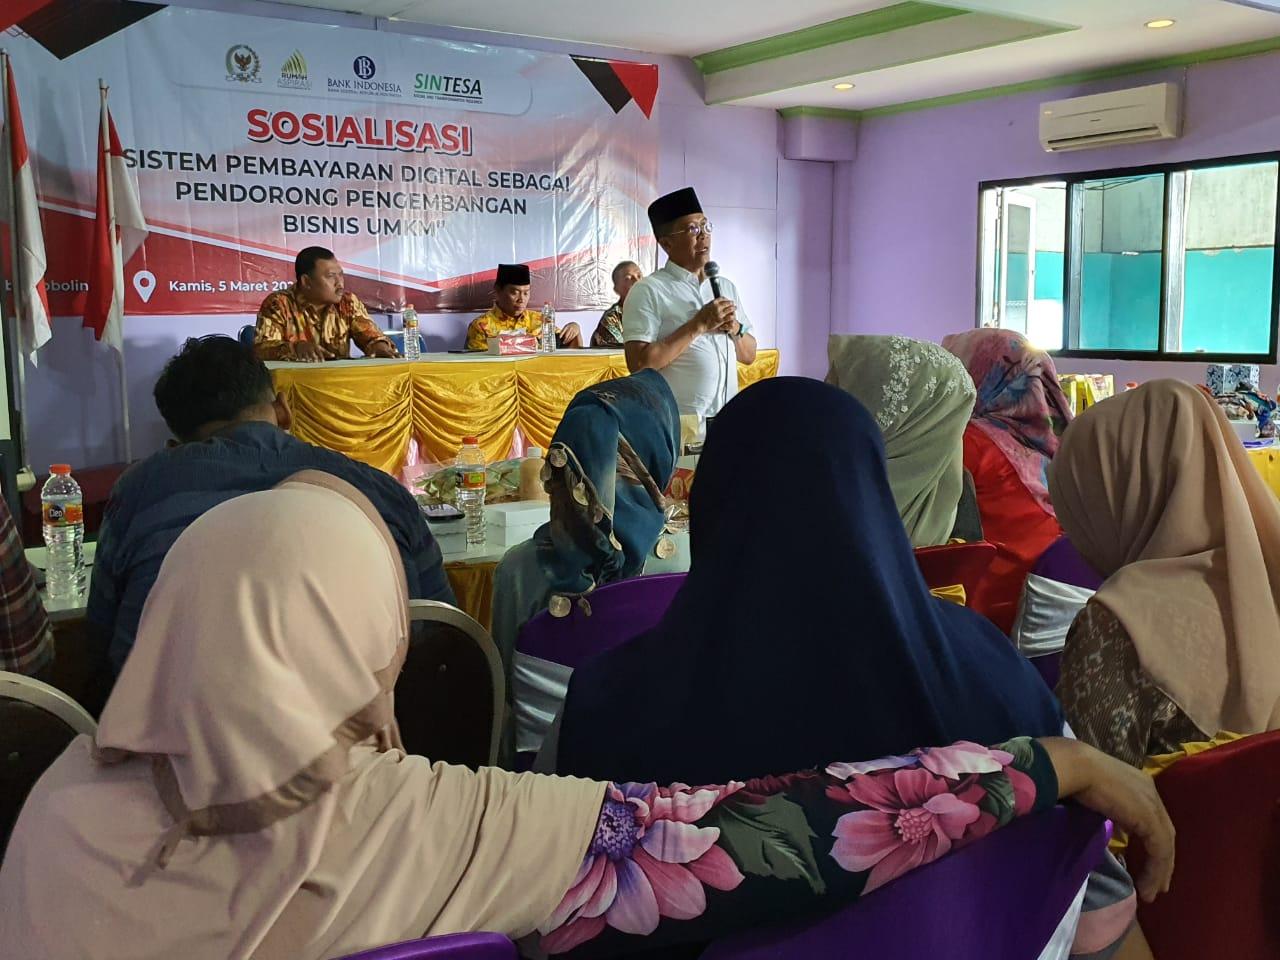 Blusukan ke Probolinggo, Misbakhun Ajak Bank Indonesia Perkuat Sektor UMKM